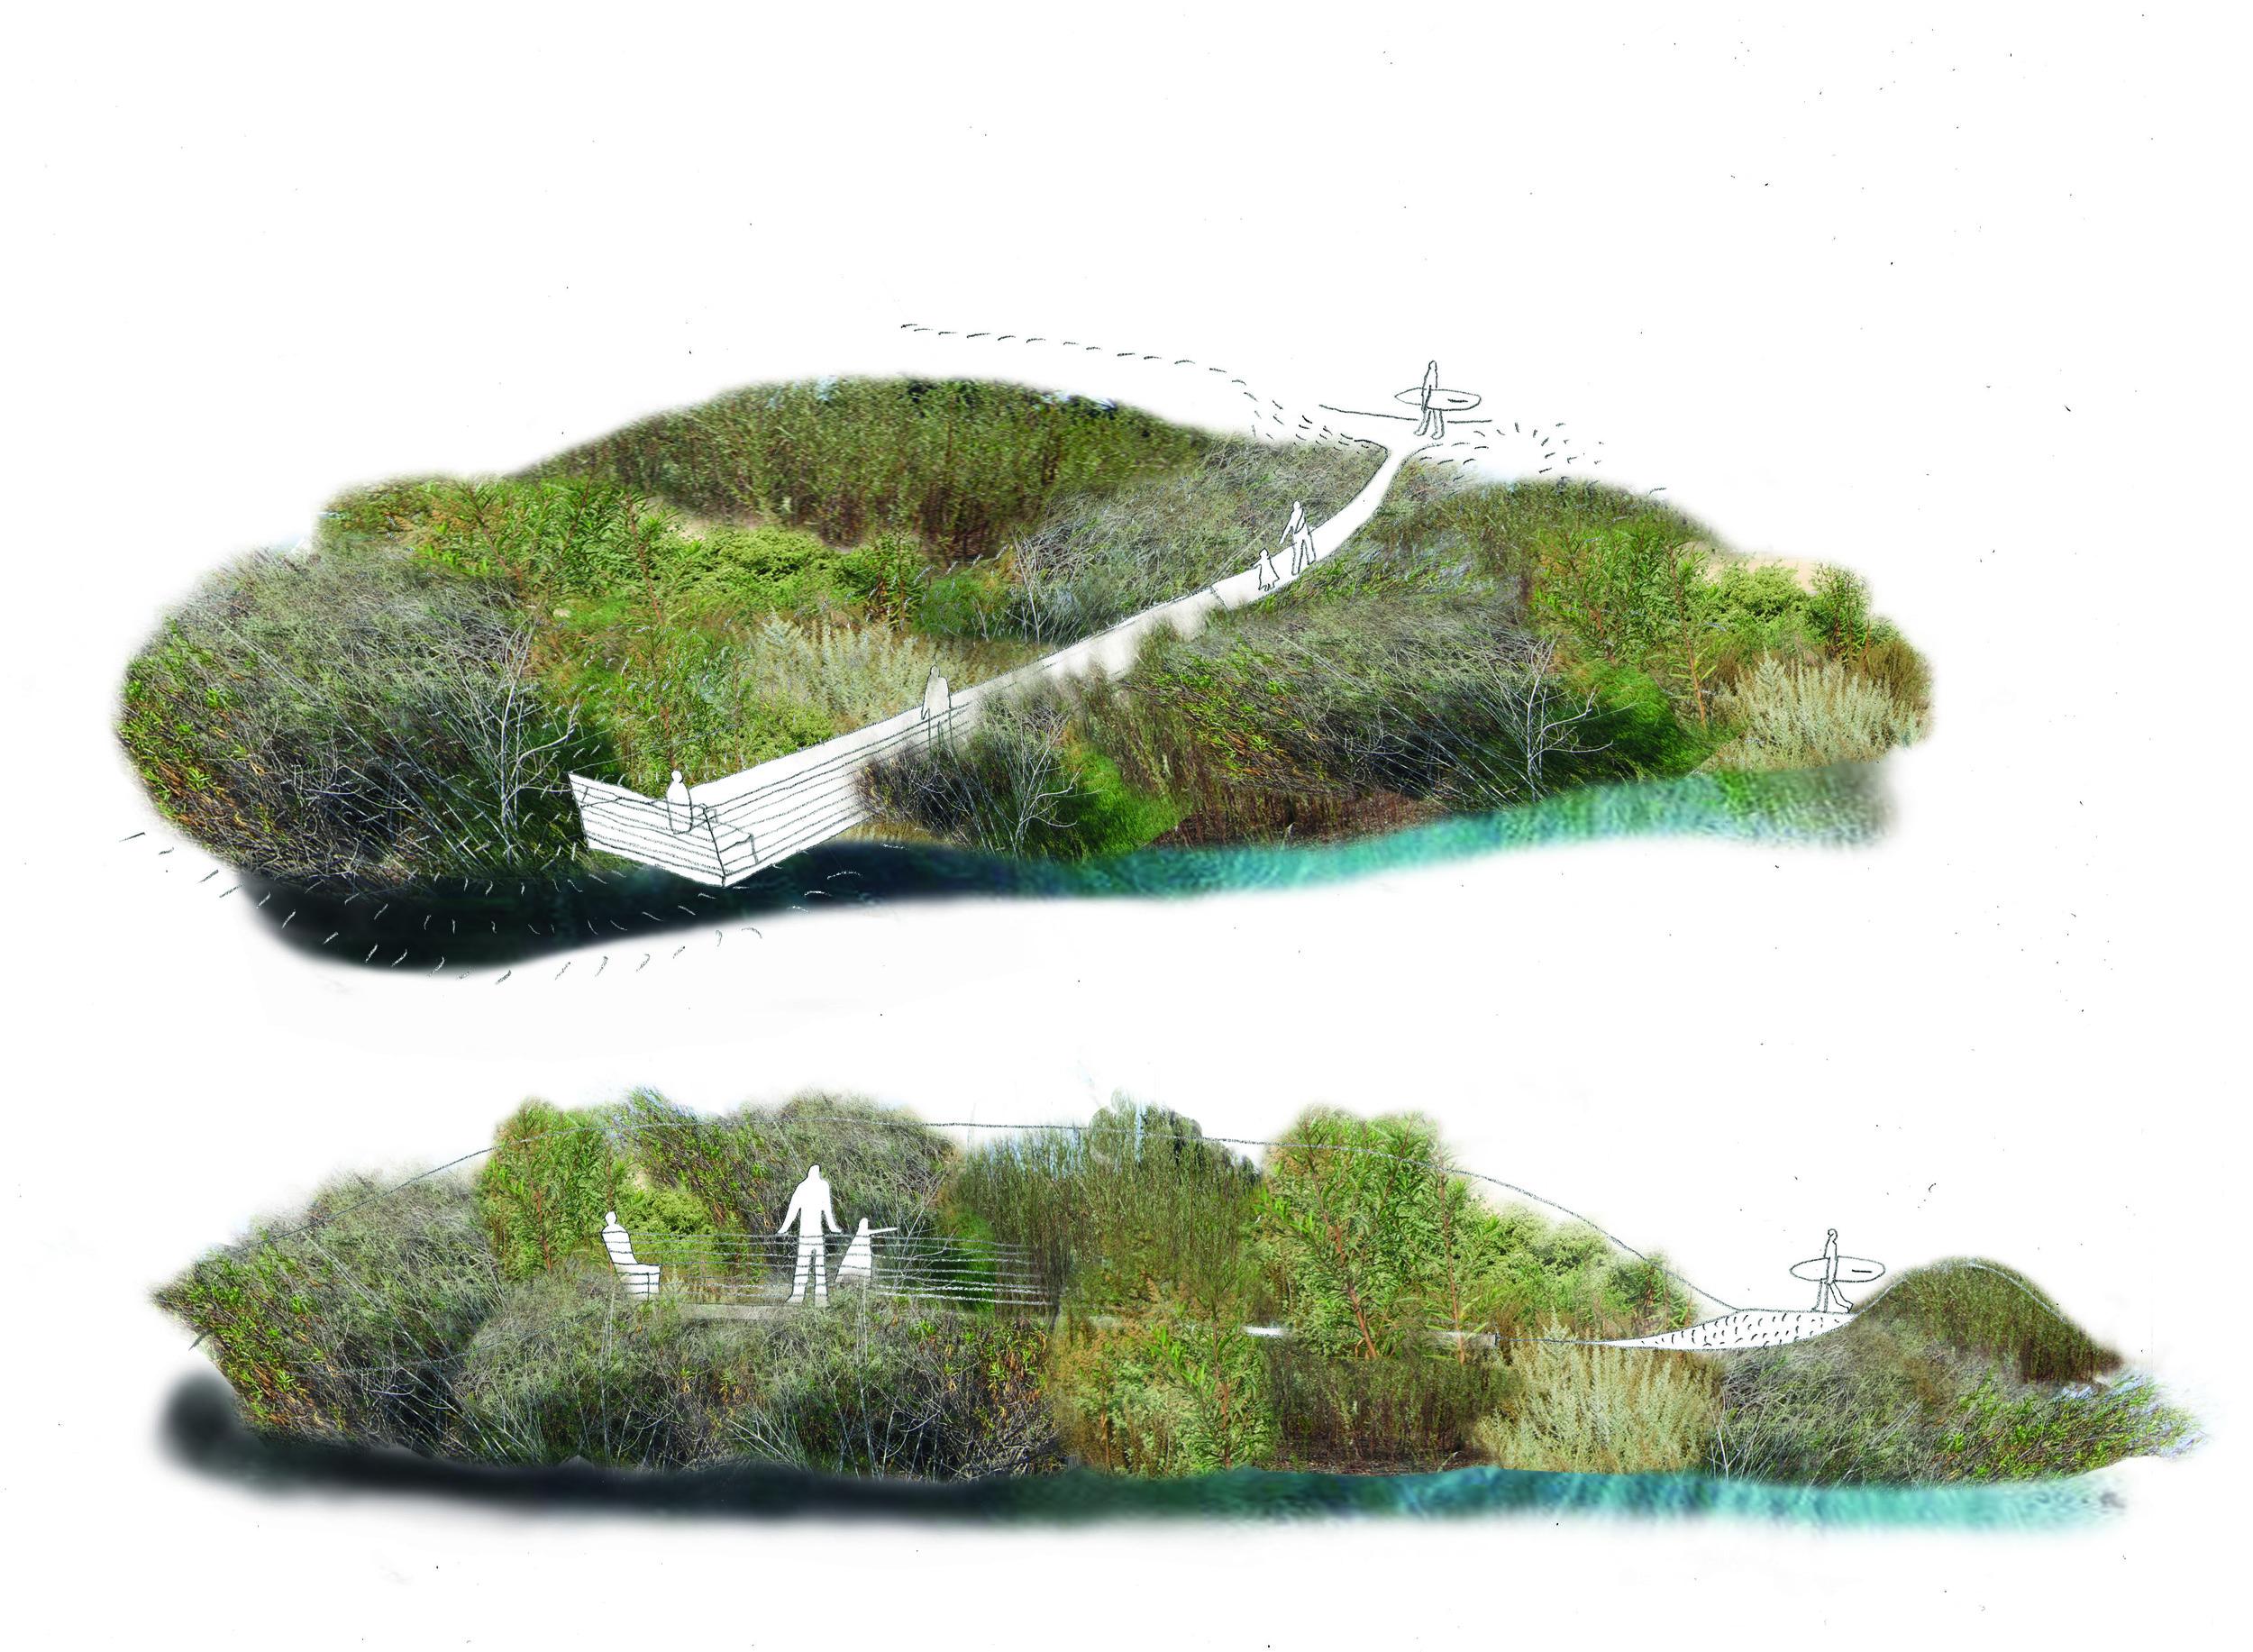 8-bunch-design-malibu-lagoon-091110_overlook_revised_FLAT.jpg